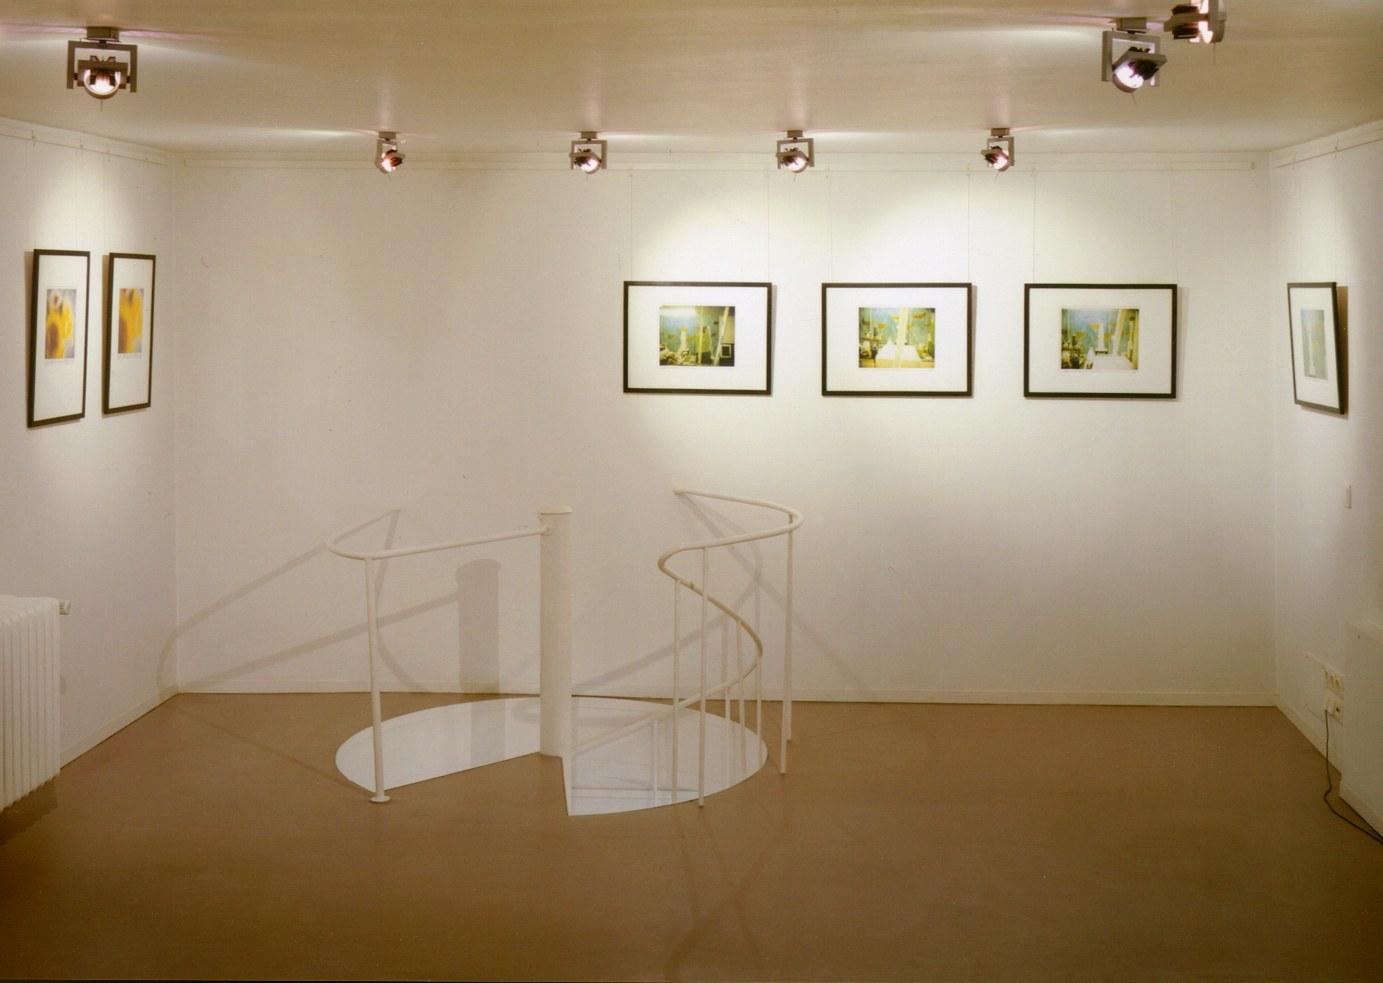 Schirmer-Mosel Galerie Raum oben